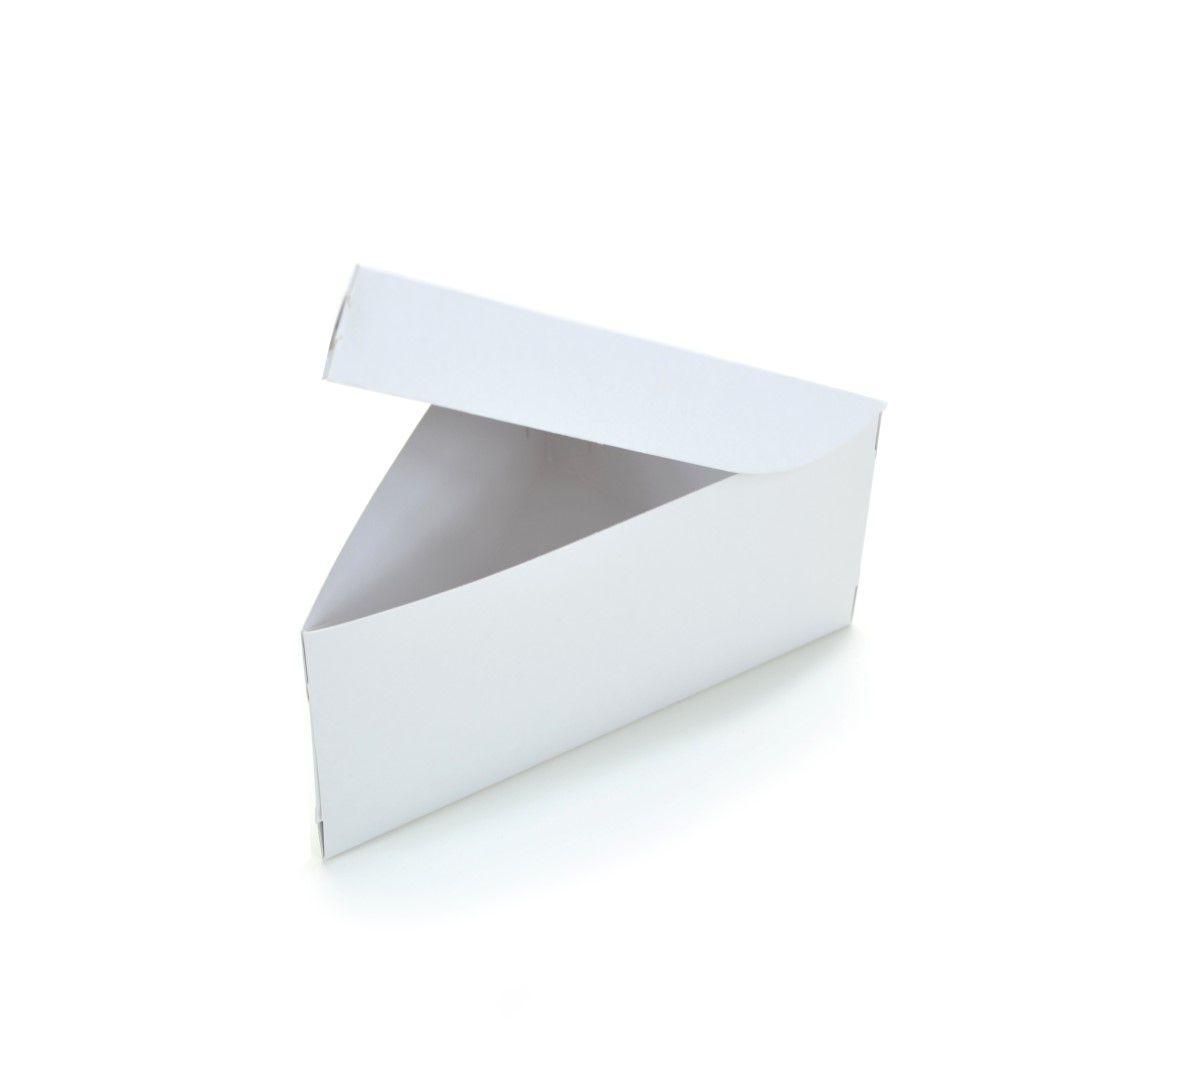 Ref 137 Branca - Embalagem Fatia de Bolo / Torta - 16,5x11x8 cm - c/ 10 unidades